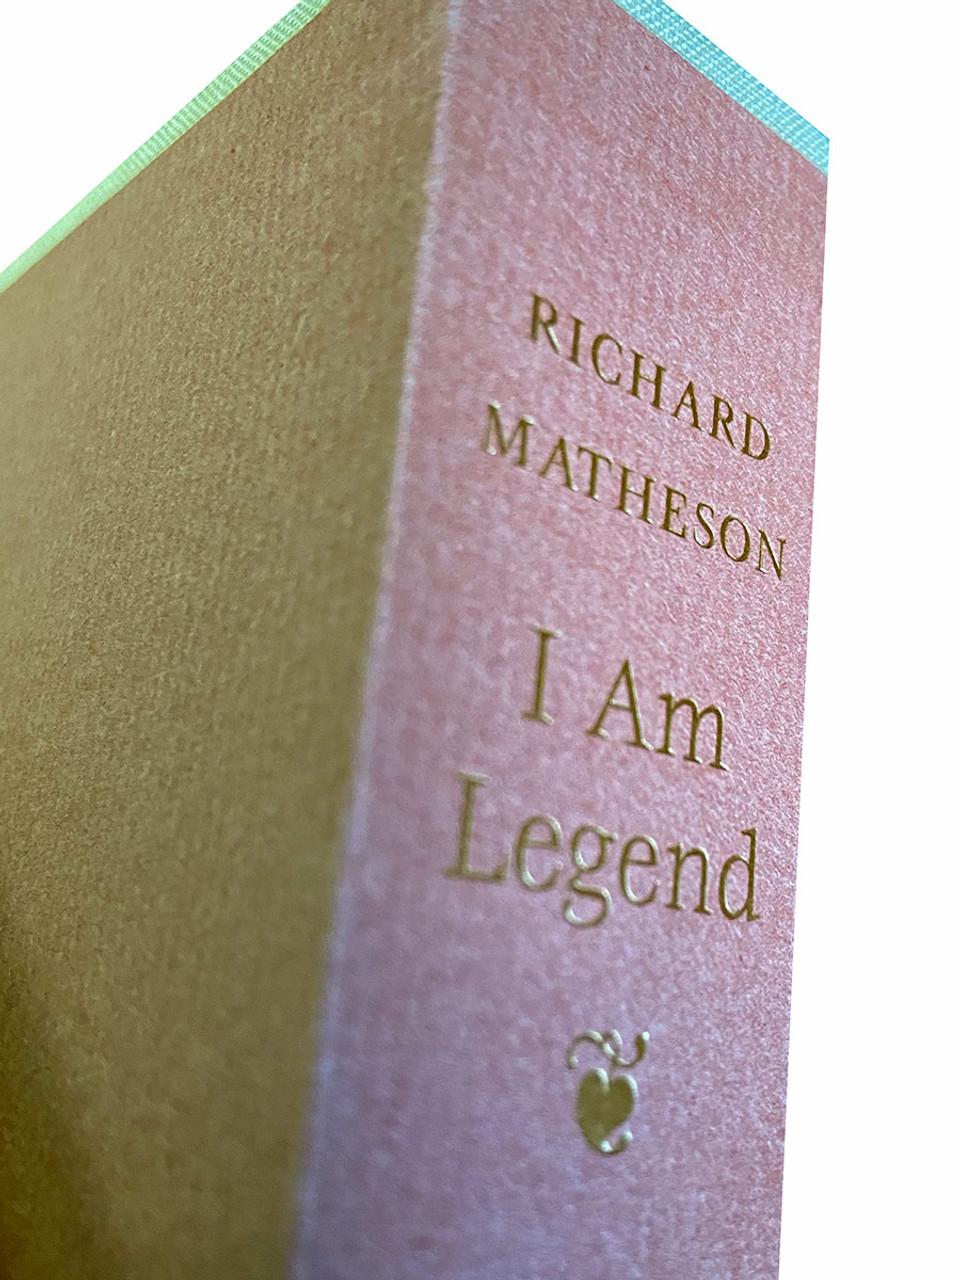 "Richard Matheson ""I Am Legend"" Signed Limited Edition No. 90 of 250 , Slipcased [Very Fine]"